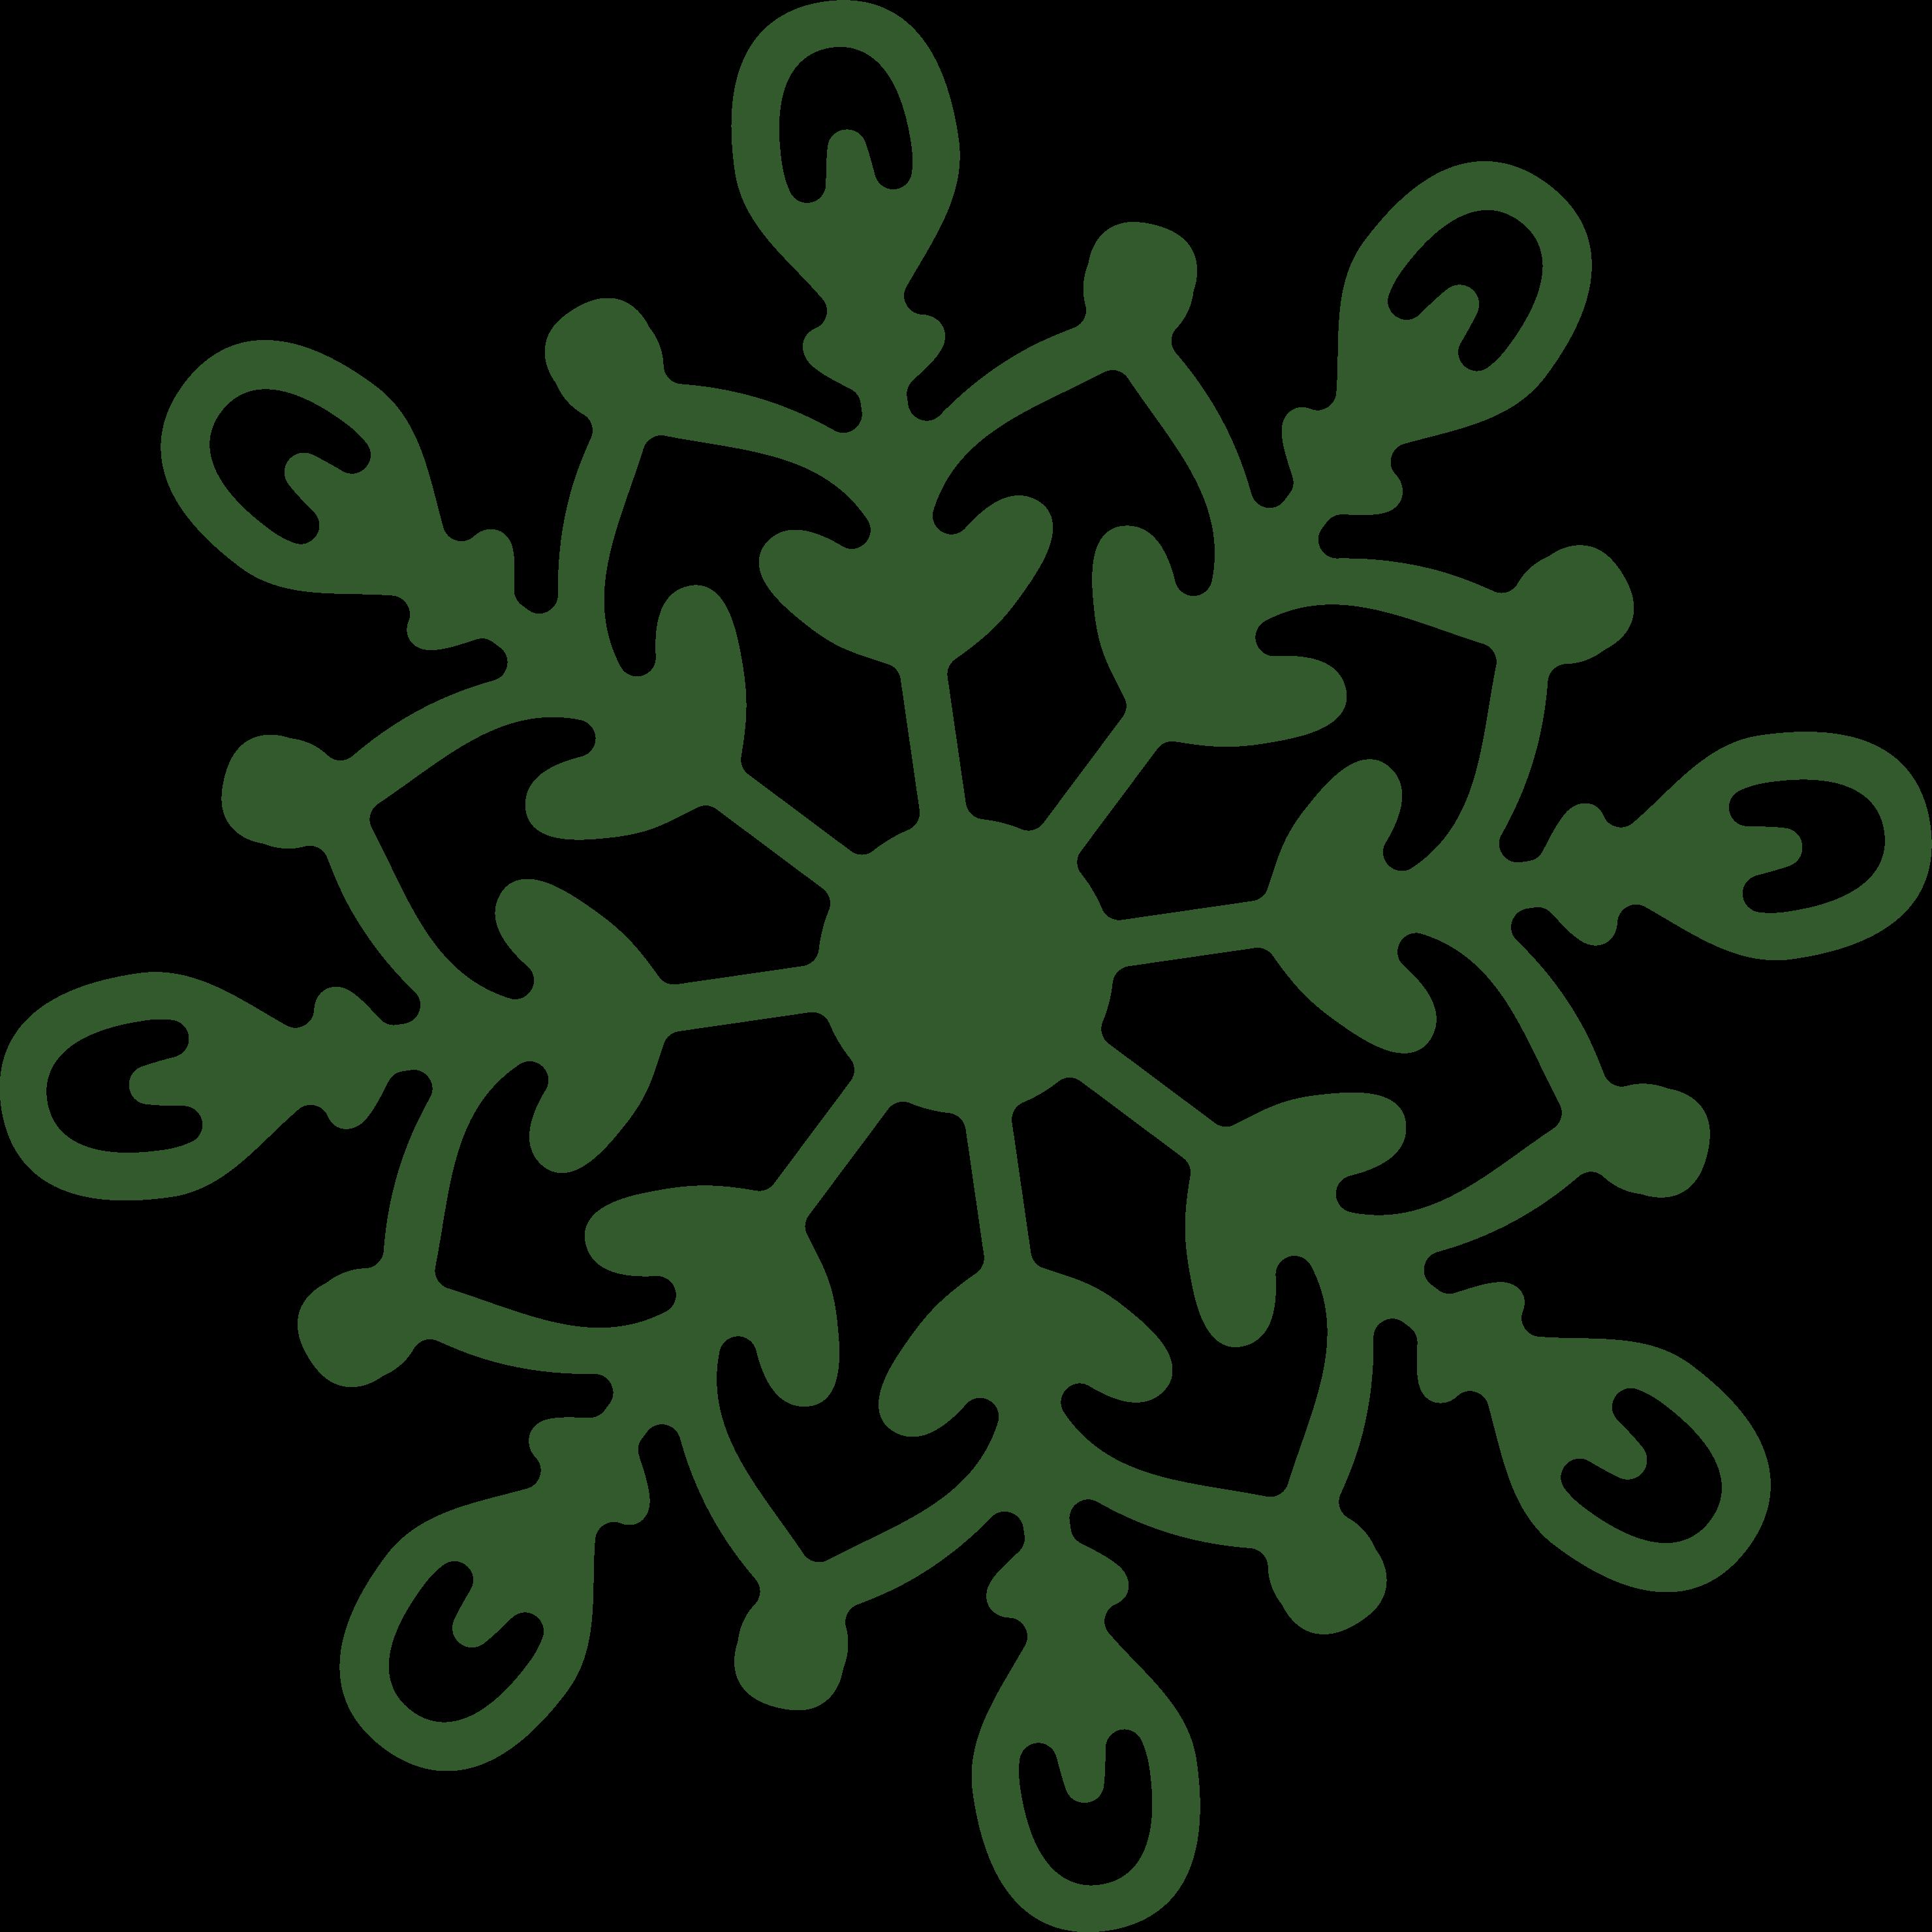 Snowflake 3 SVG Cut File